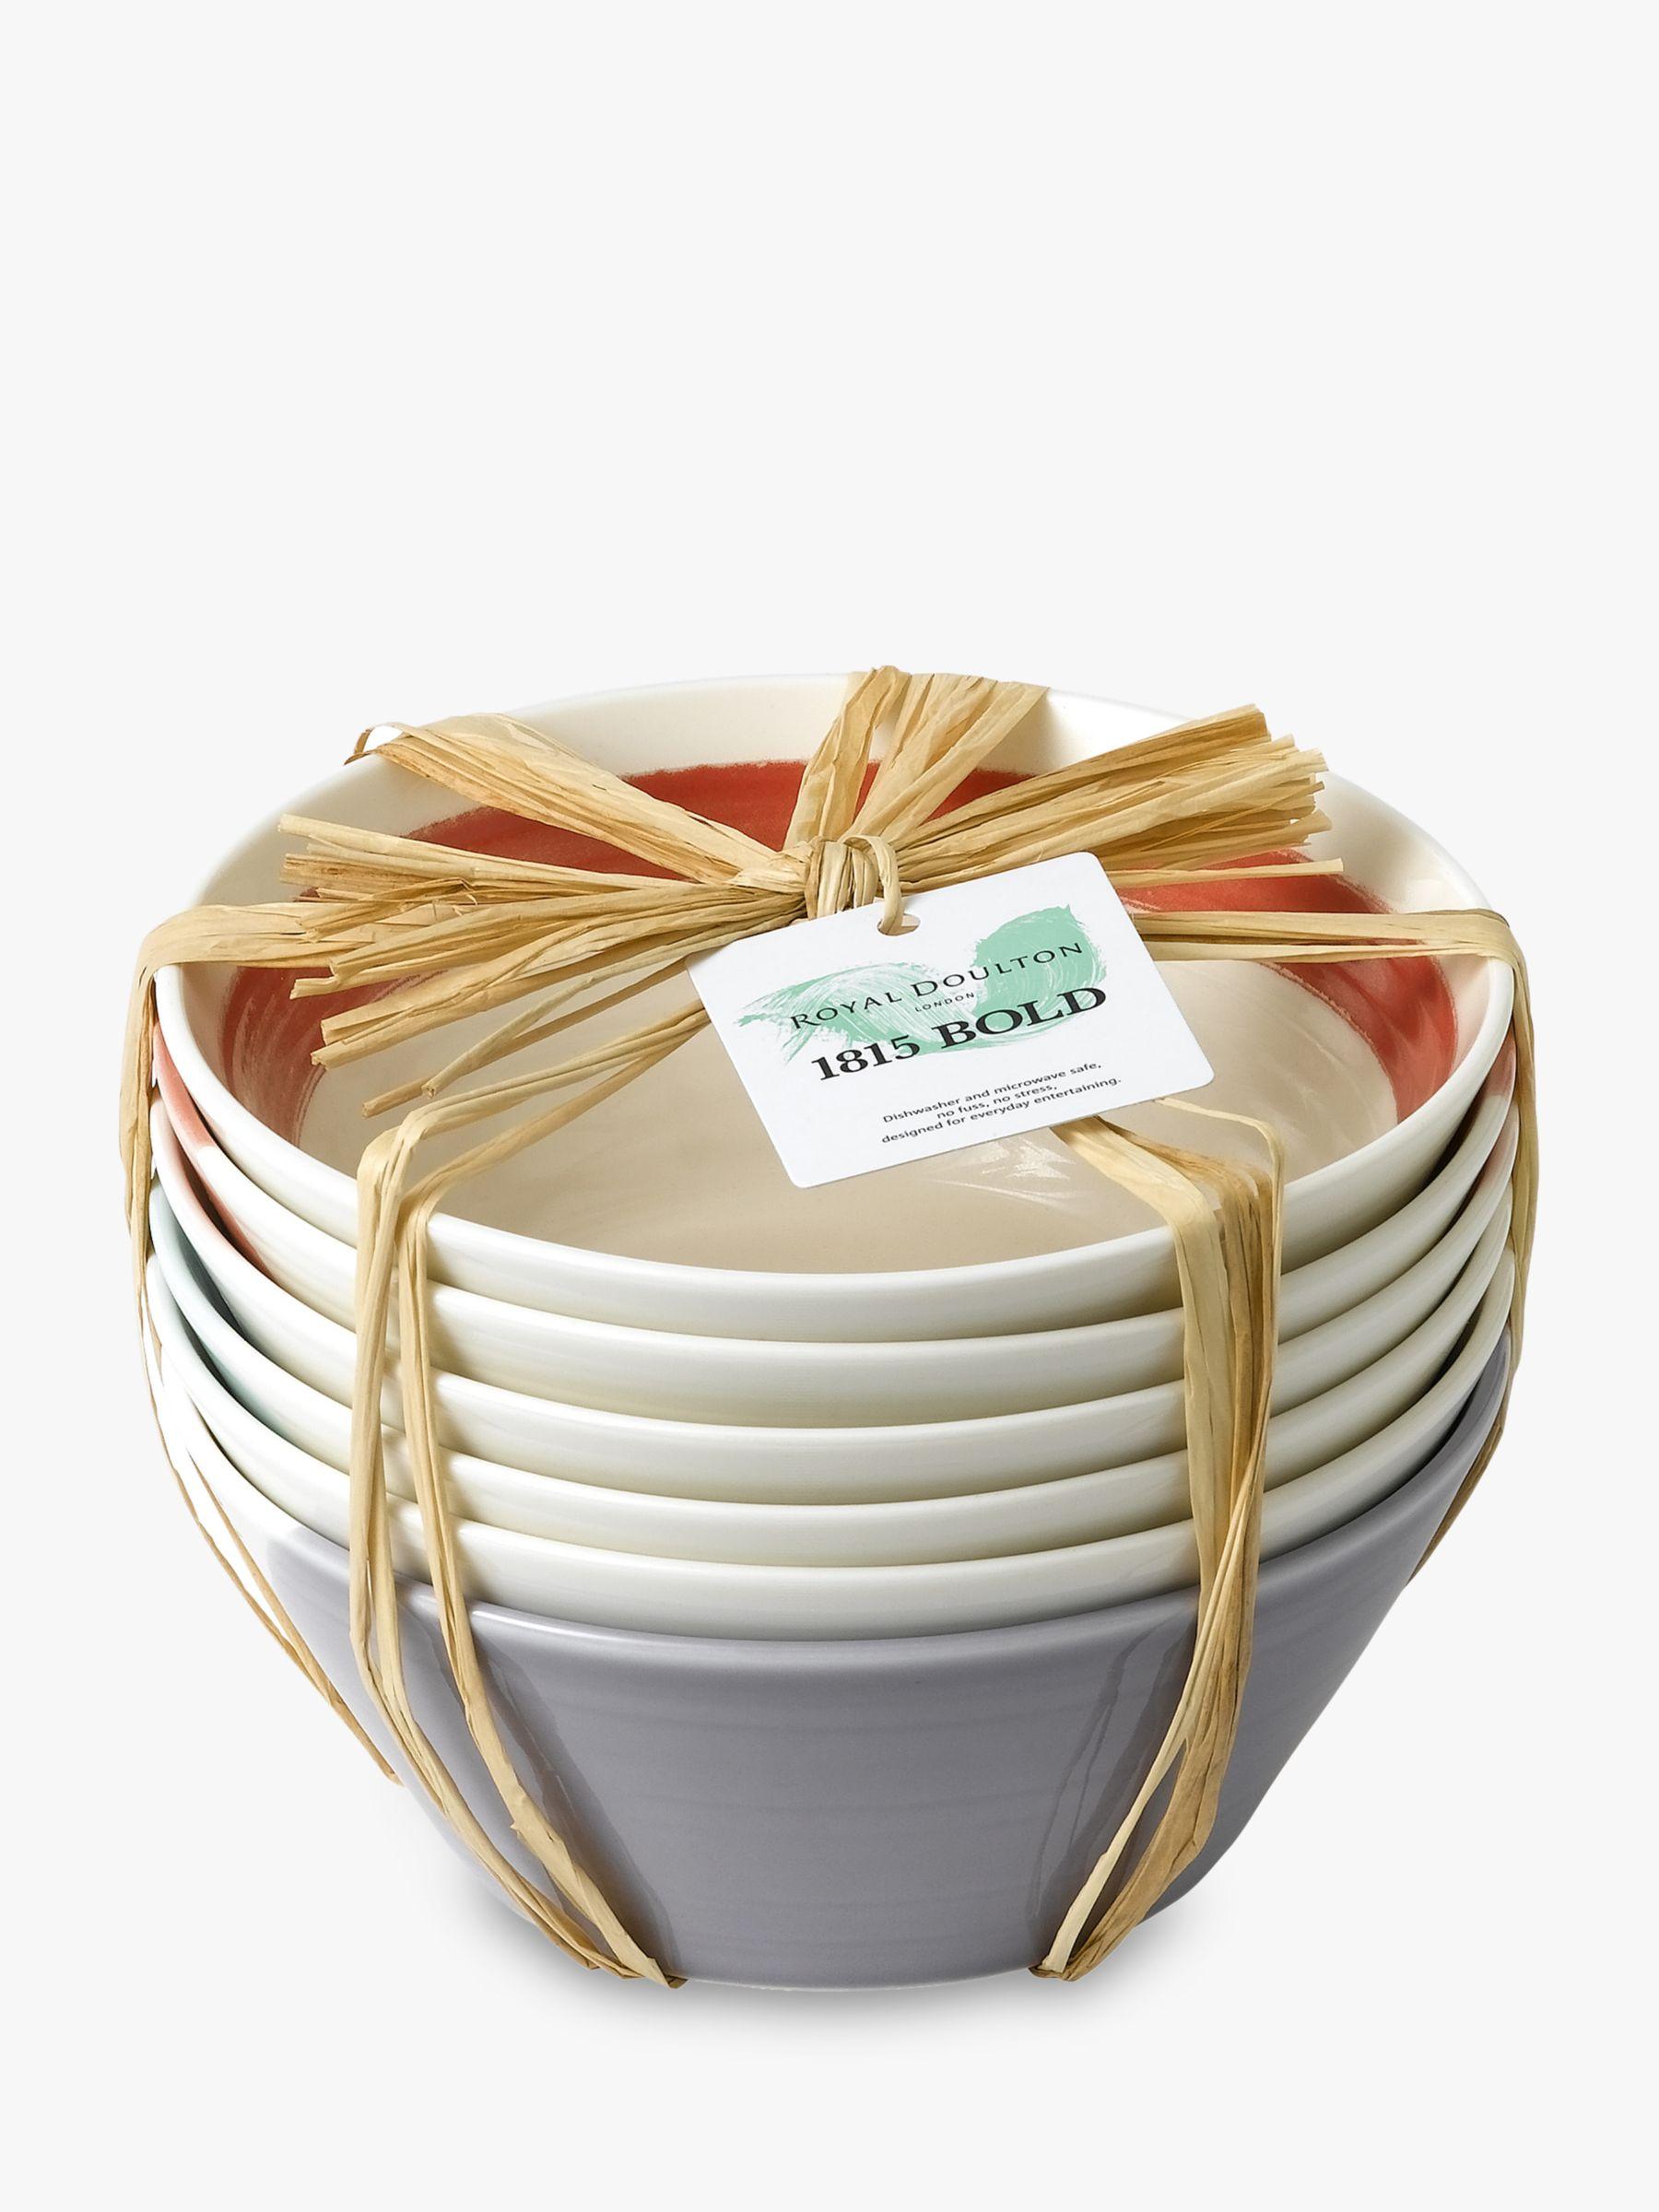 Royal Doulton Royal Doulton 1815 Bold Cereal Bowls, Set of 6, 16cm, Assorted